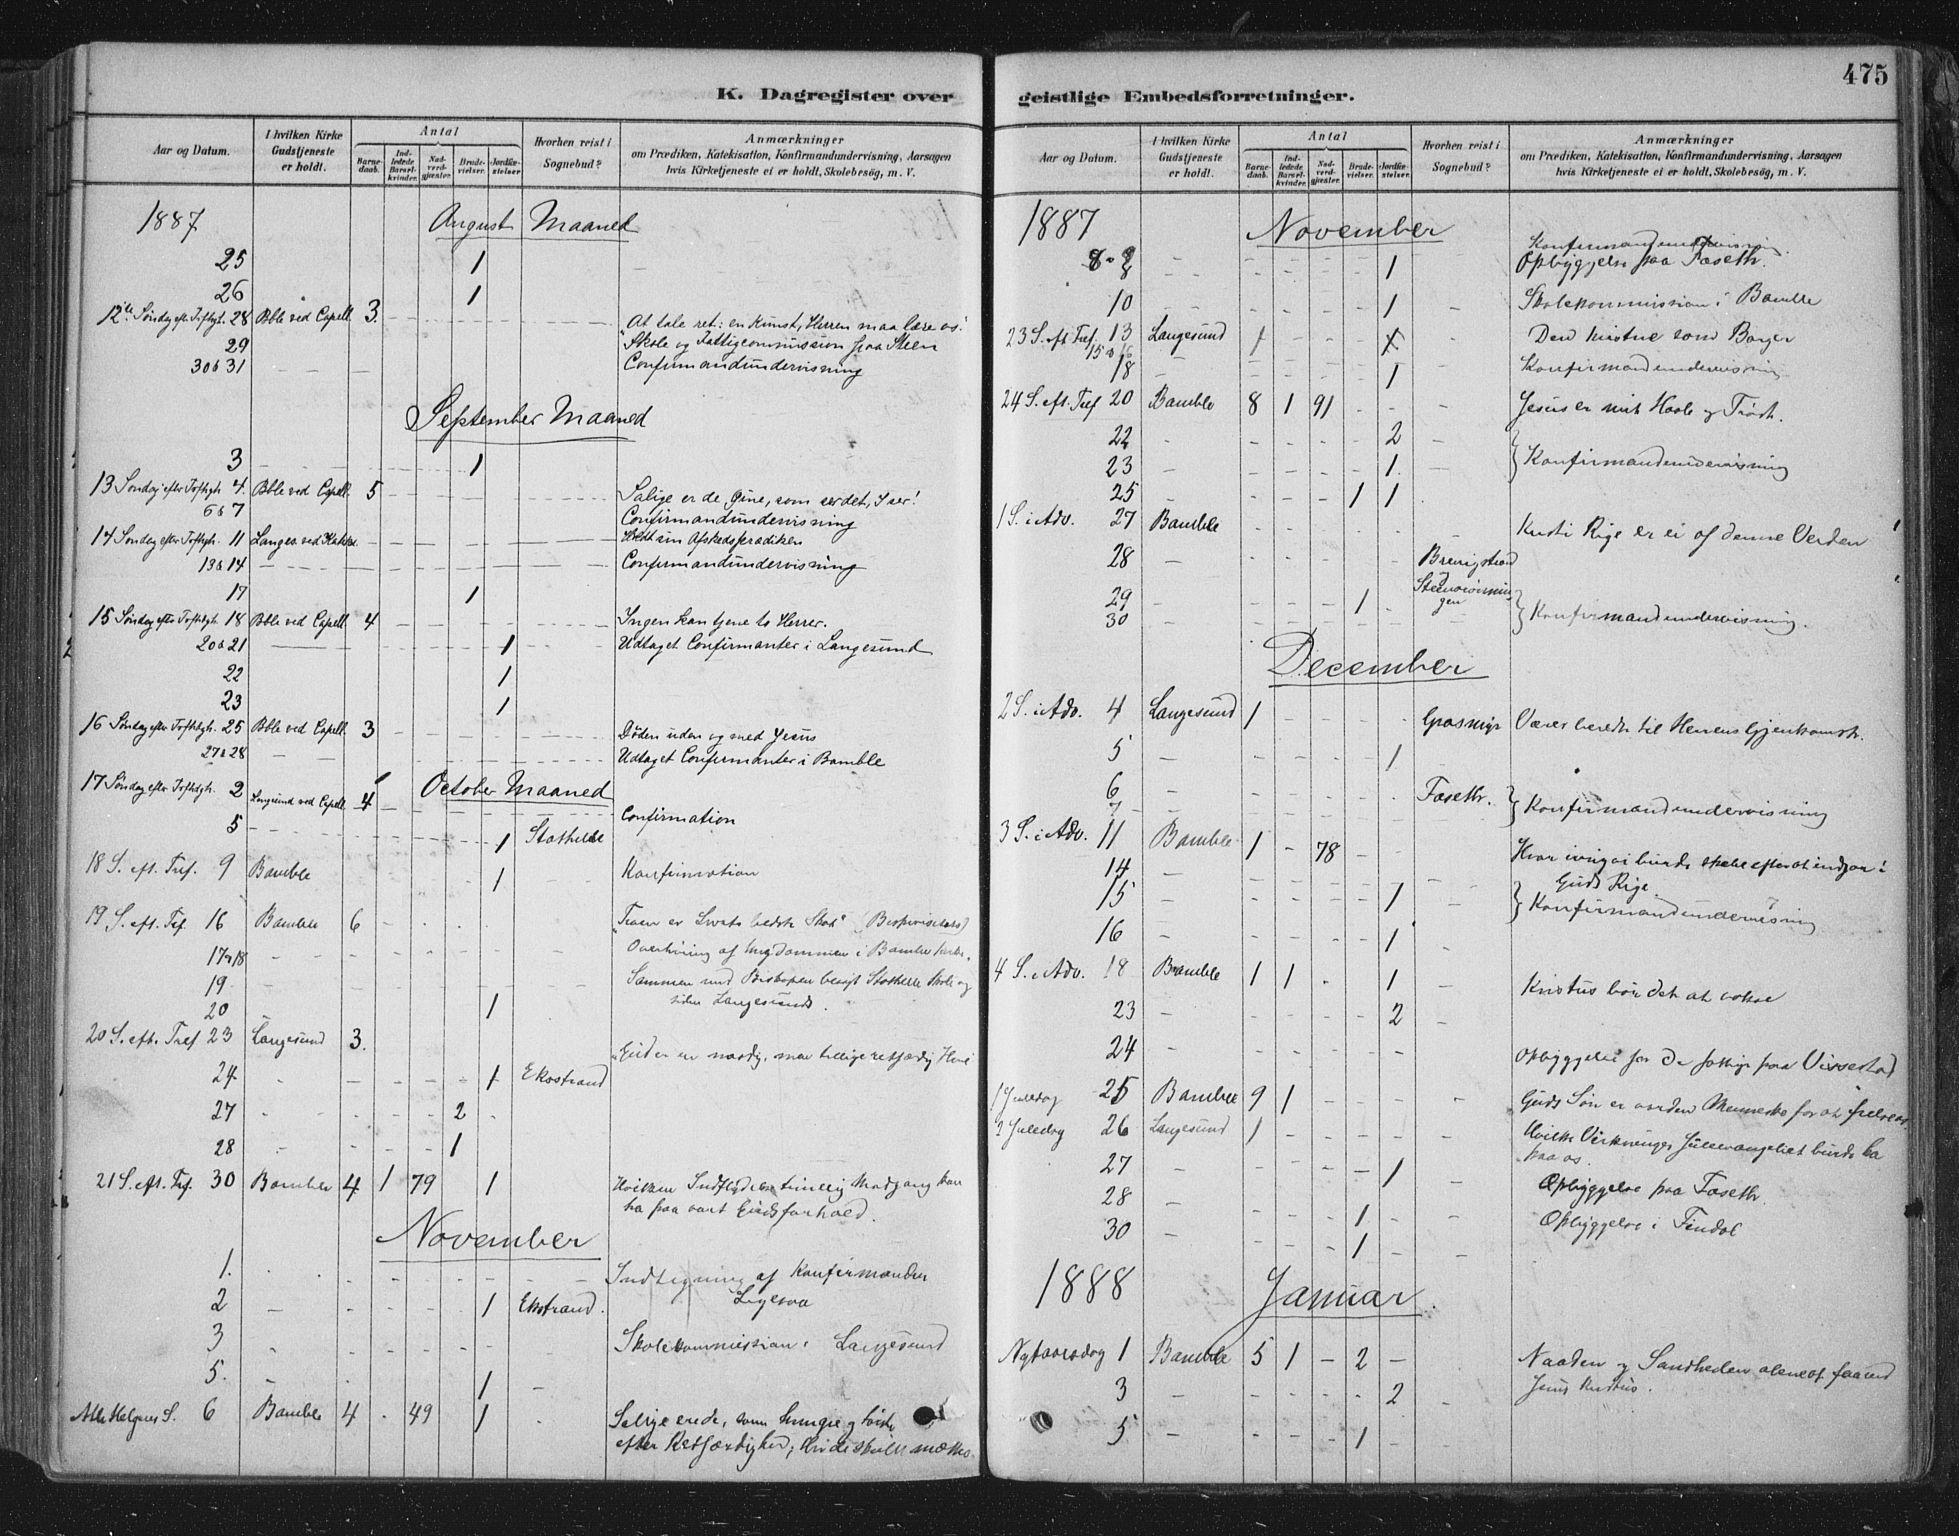 SAKO, Bamble kirkebøker, F/Fa/L0007: Ministerialbok nr. I 7, 1878-1888, s. 475